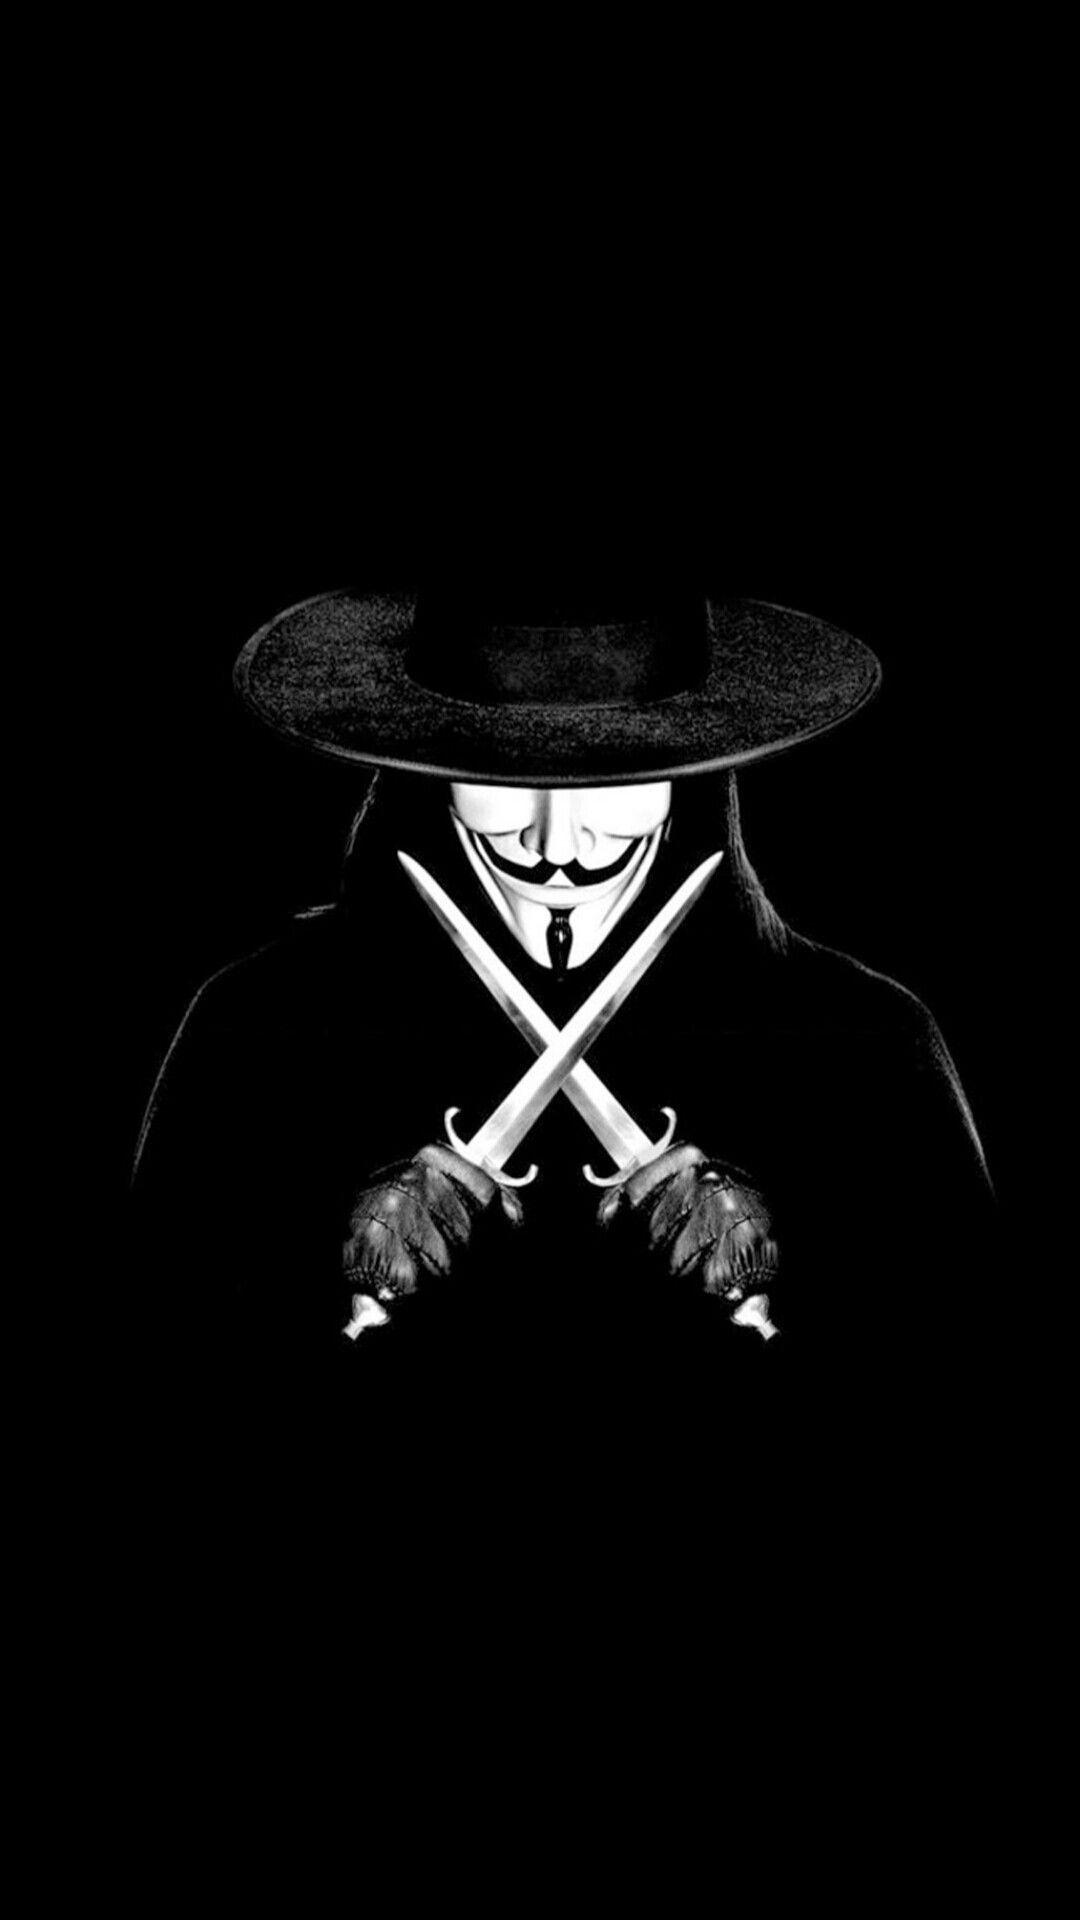 V De Vingança 4k 4k Vingança Vendeta V De Vingança